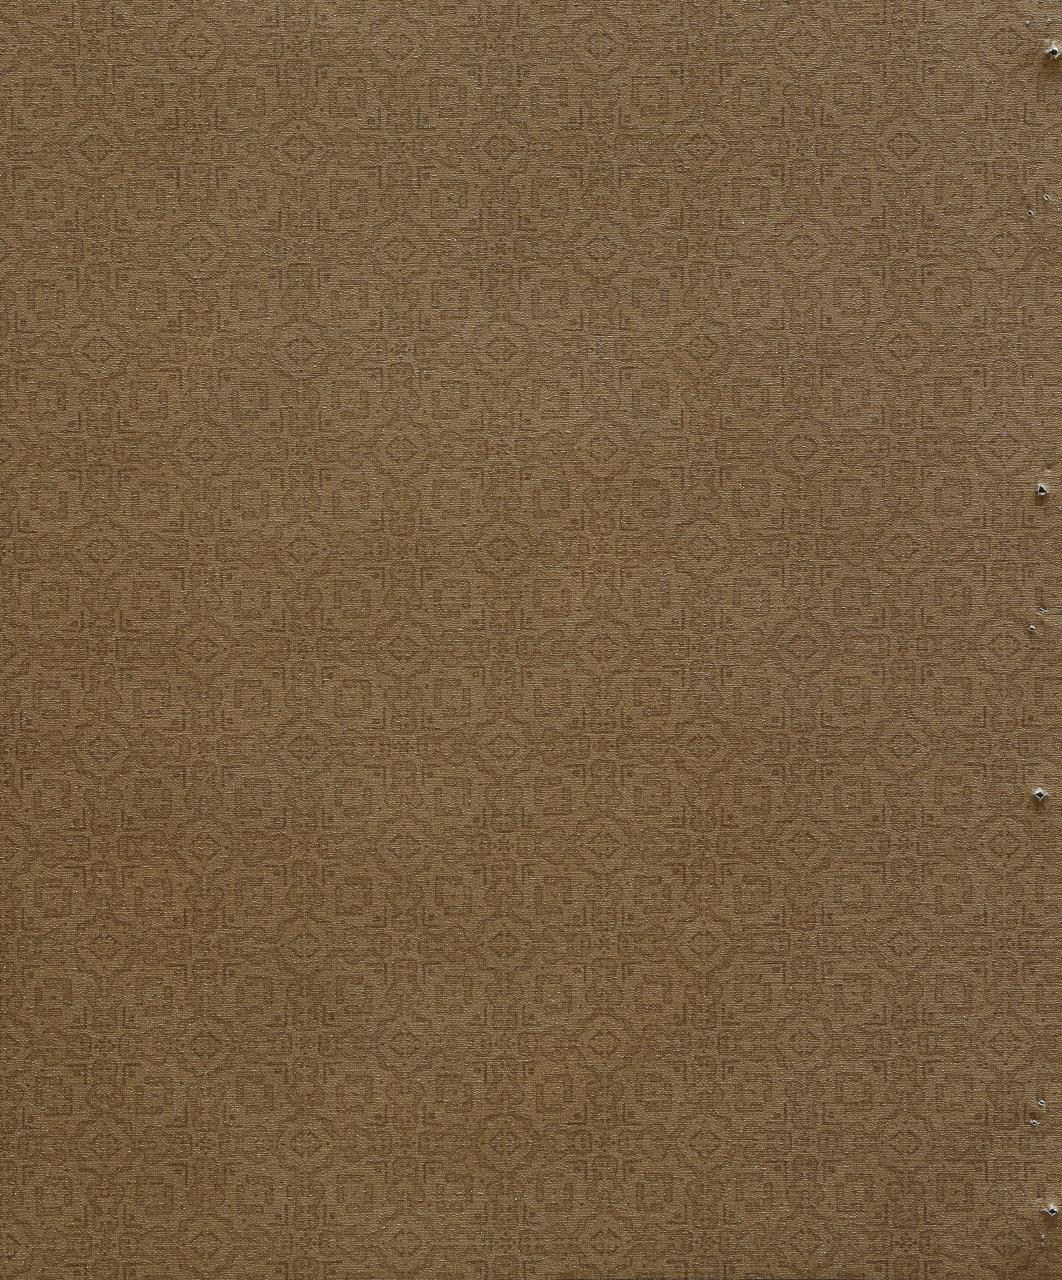 کاغذ دیواری طرح دار محو